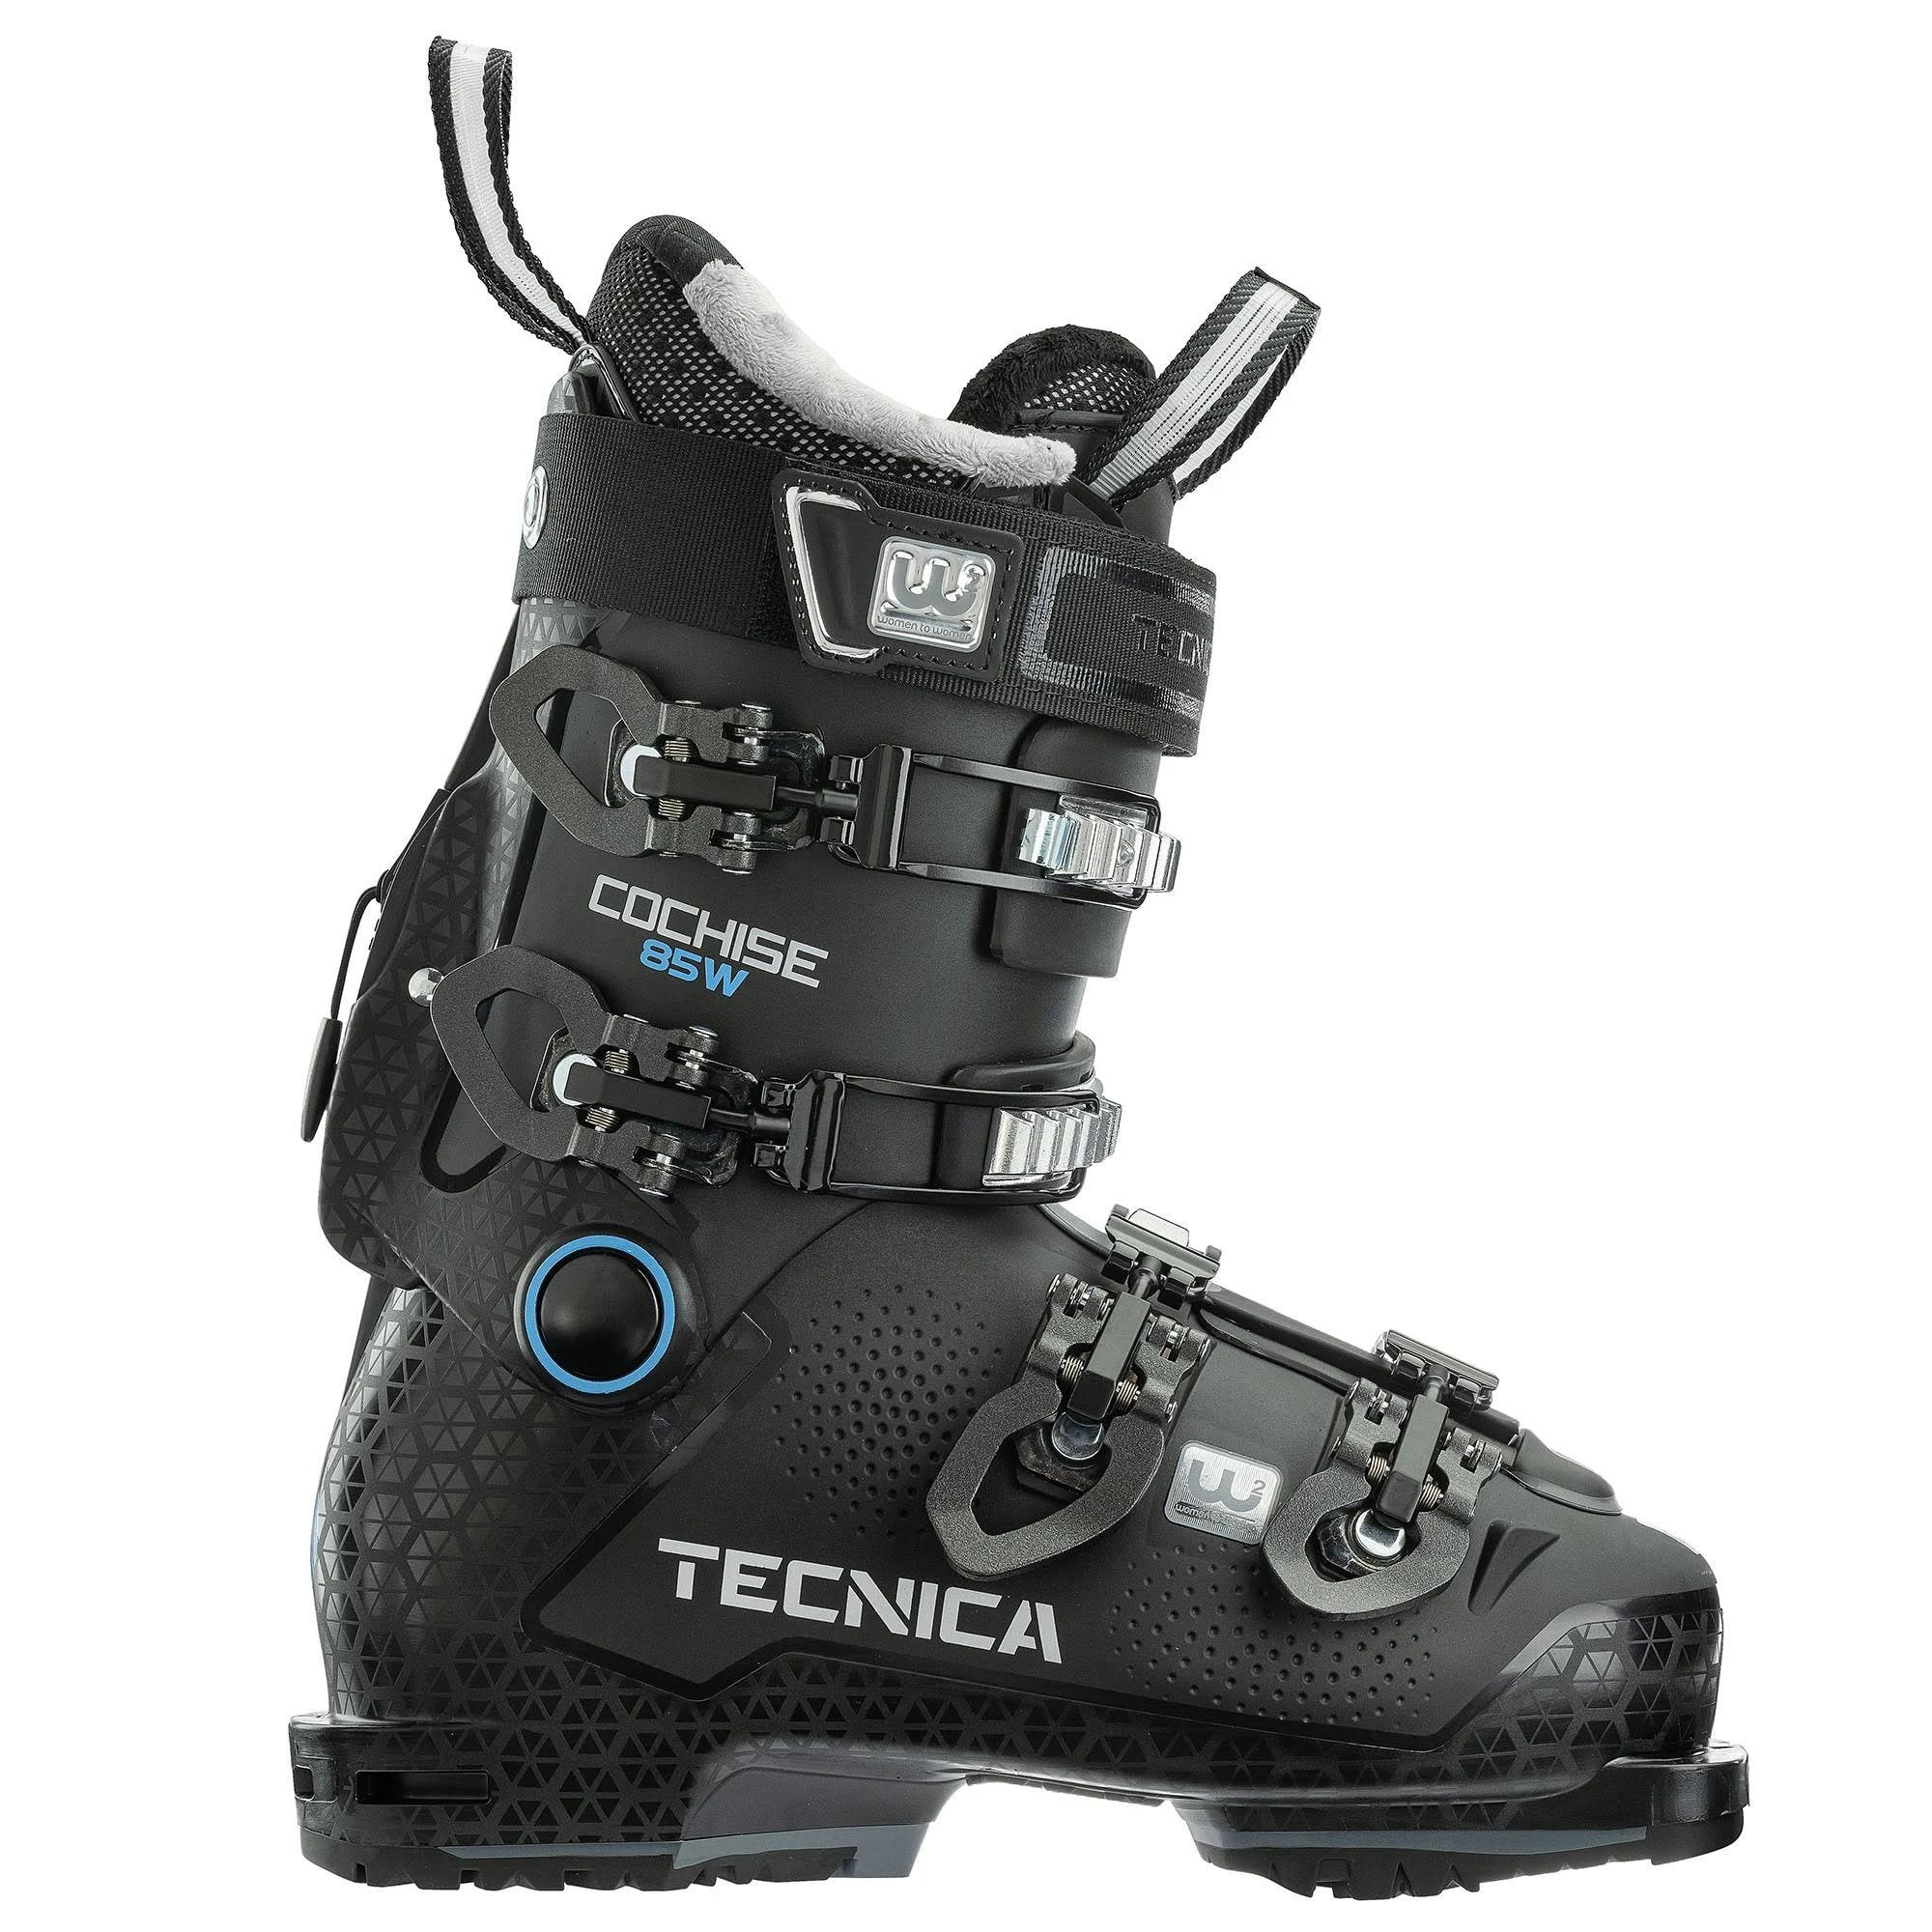 Tecnica Cochise 85 Gw Ski Boots Women's Black 25.5